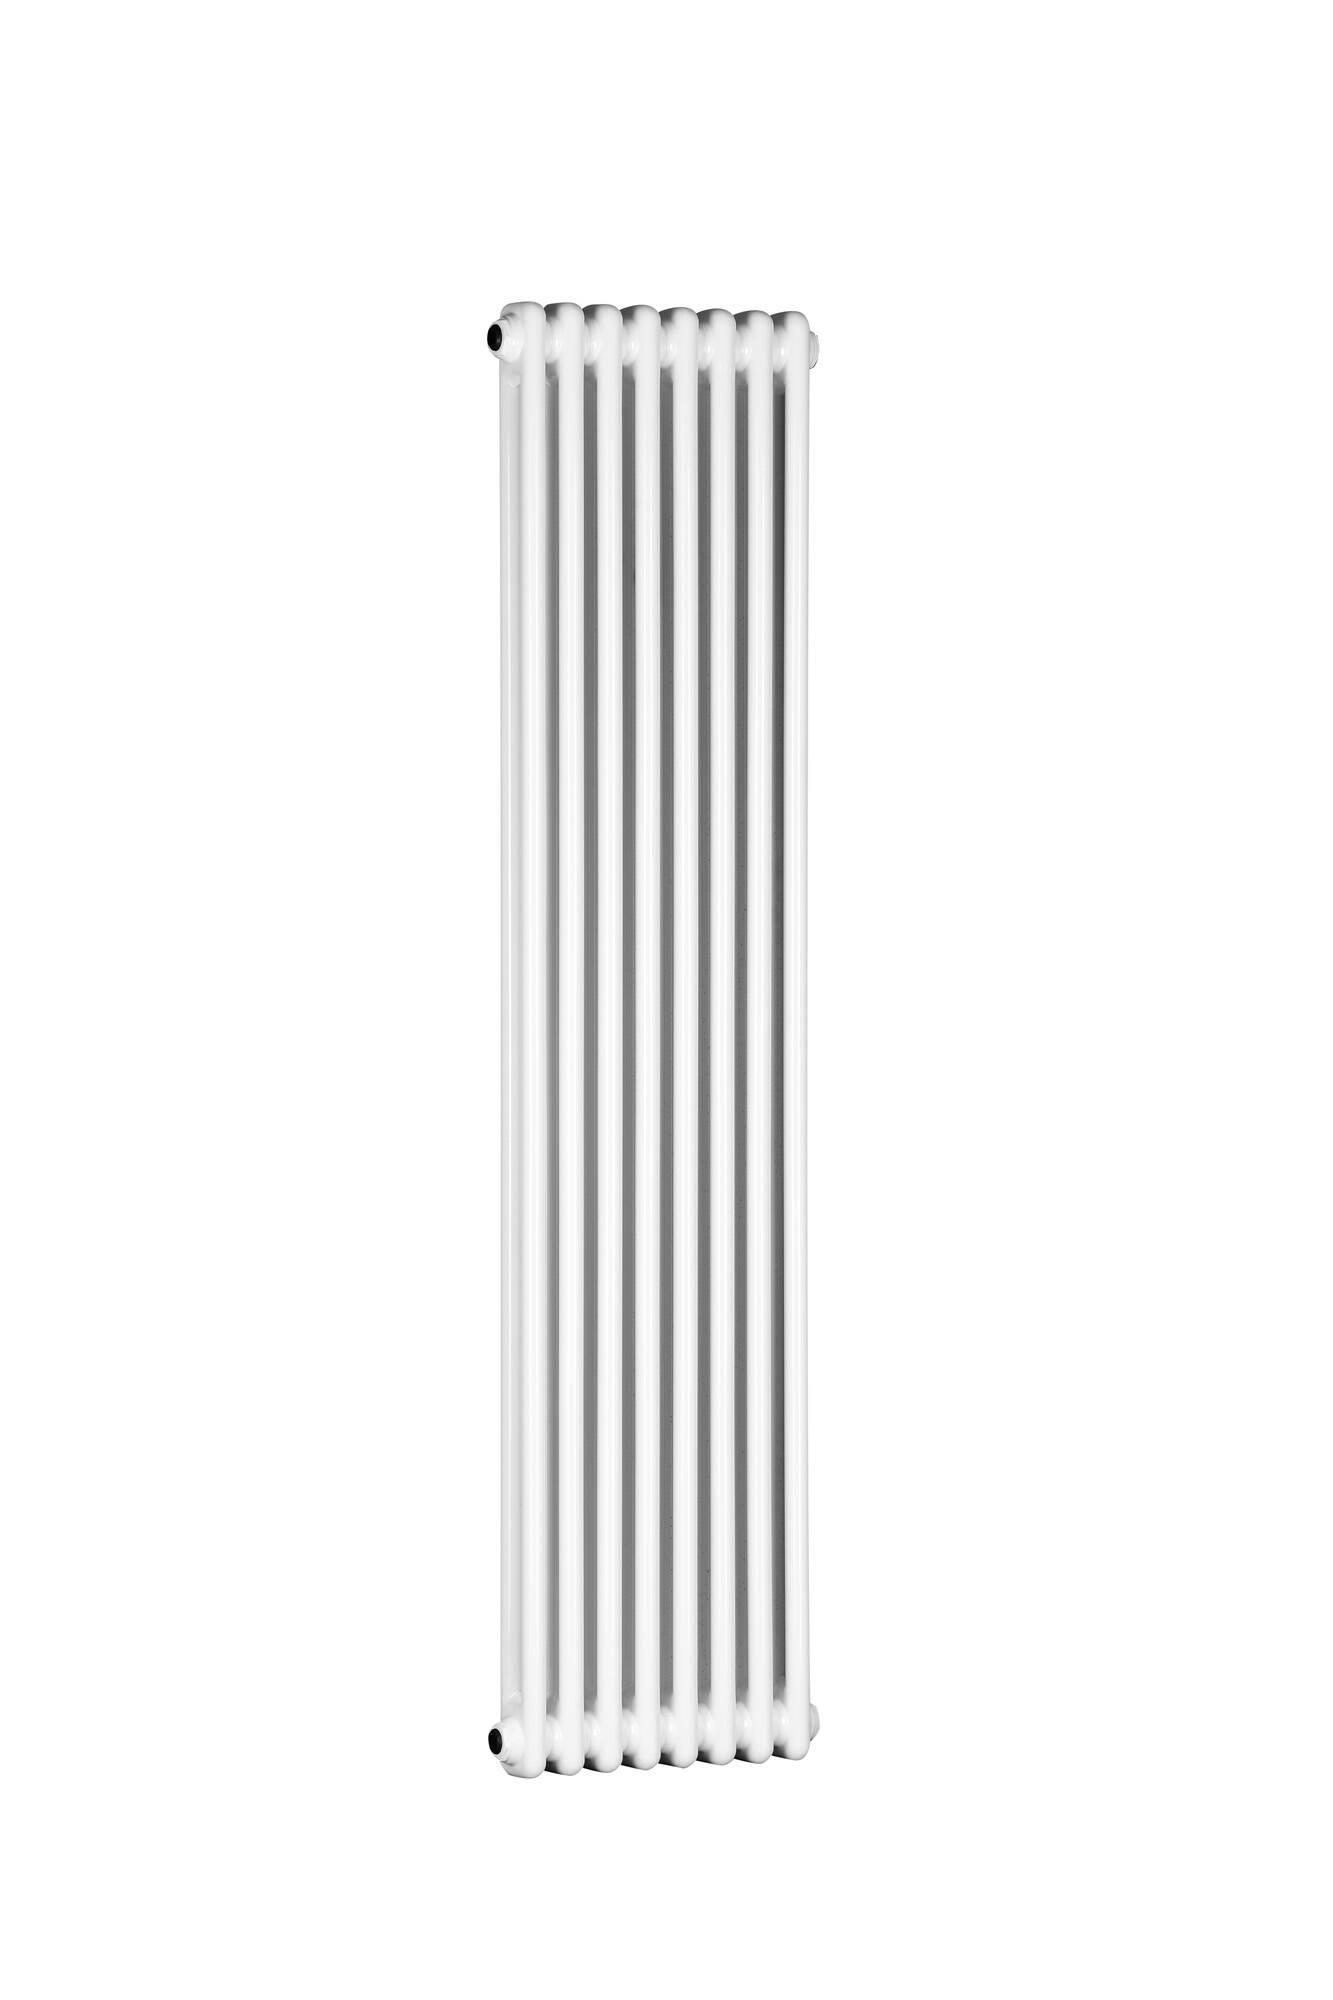 TradeRad Value 2 Column Vertical Radiators